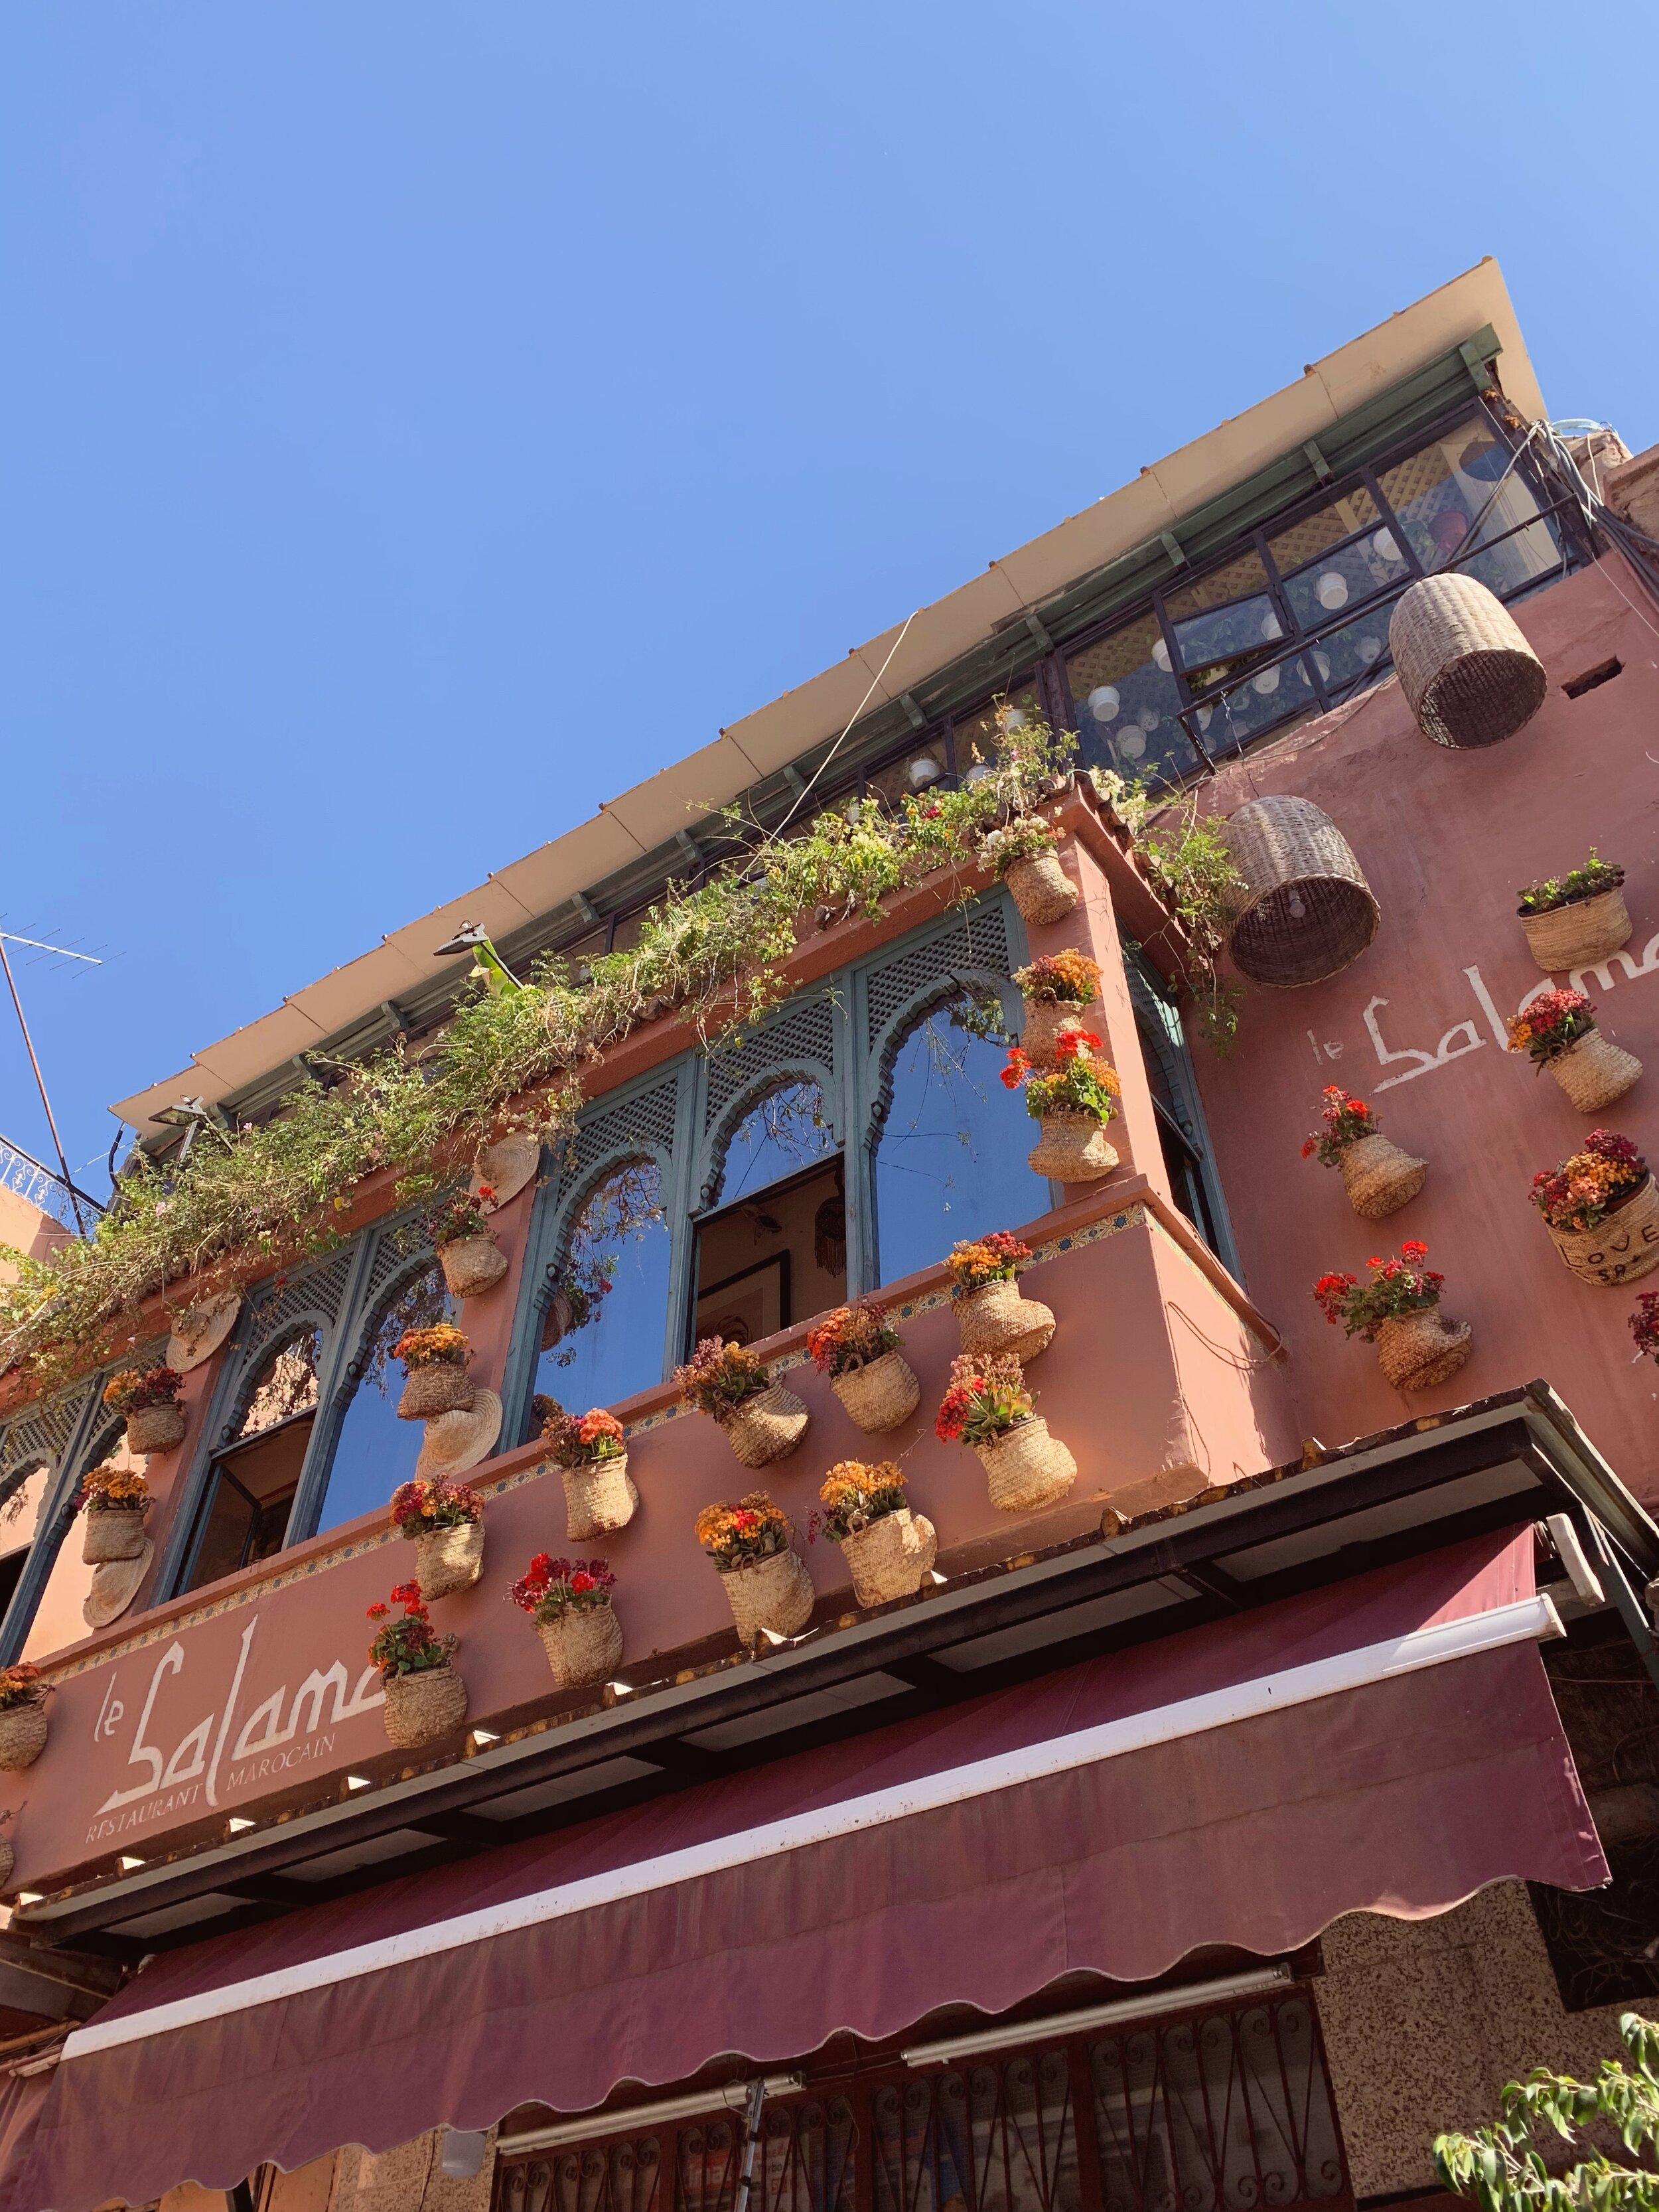 Le Salama Marrakech Morocco